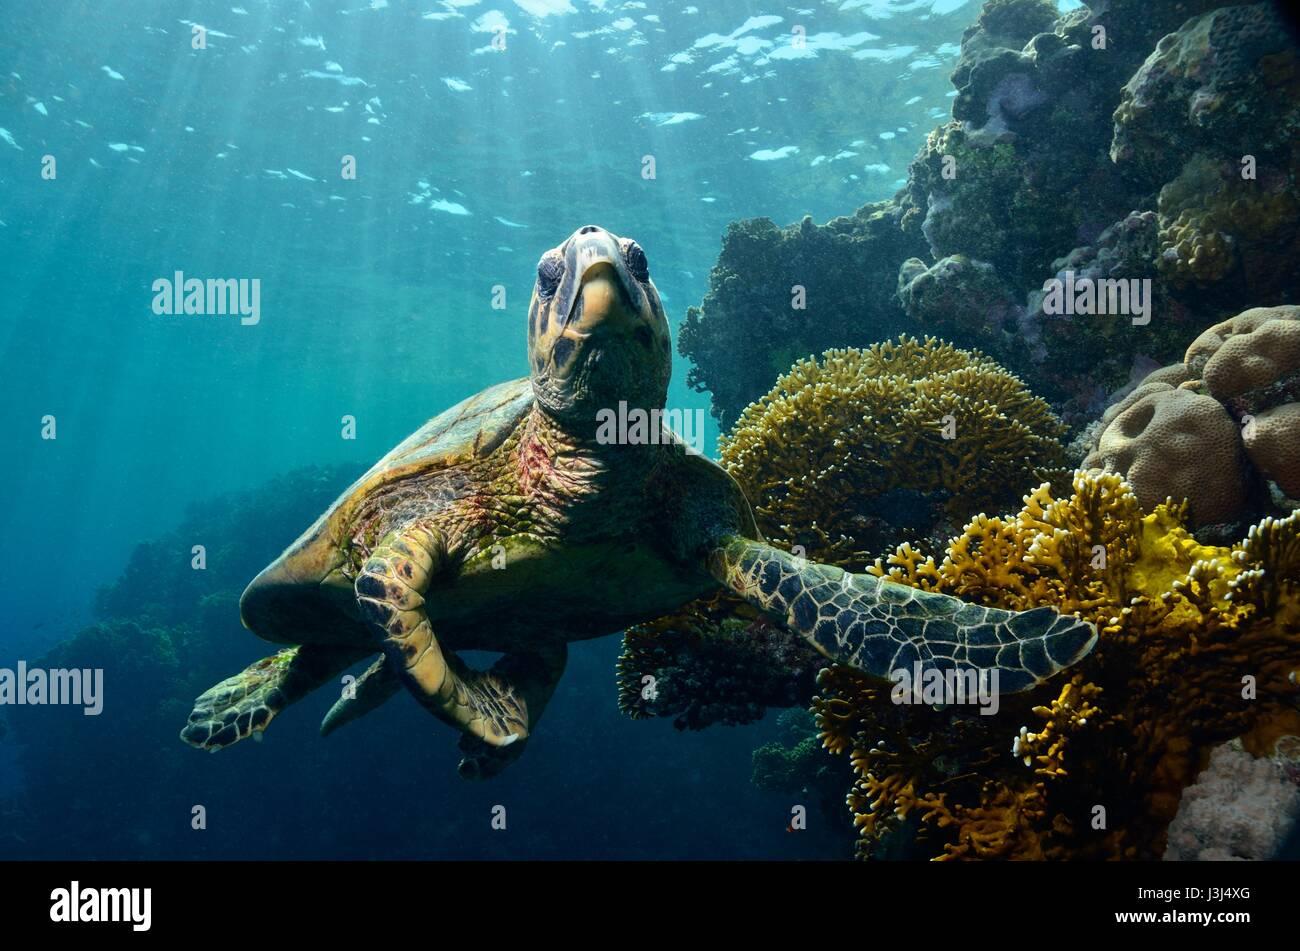 Meeresschildkröte, hawksbill tartarughe marine, Echte Karettschildkröte, Eretmochelys imbricata, Mar Rosso, Immagini Stock